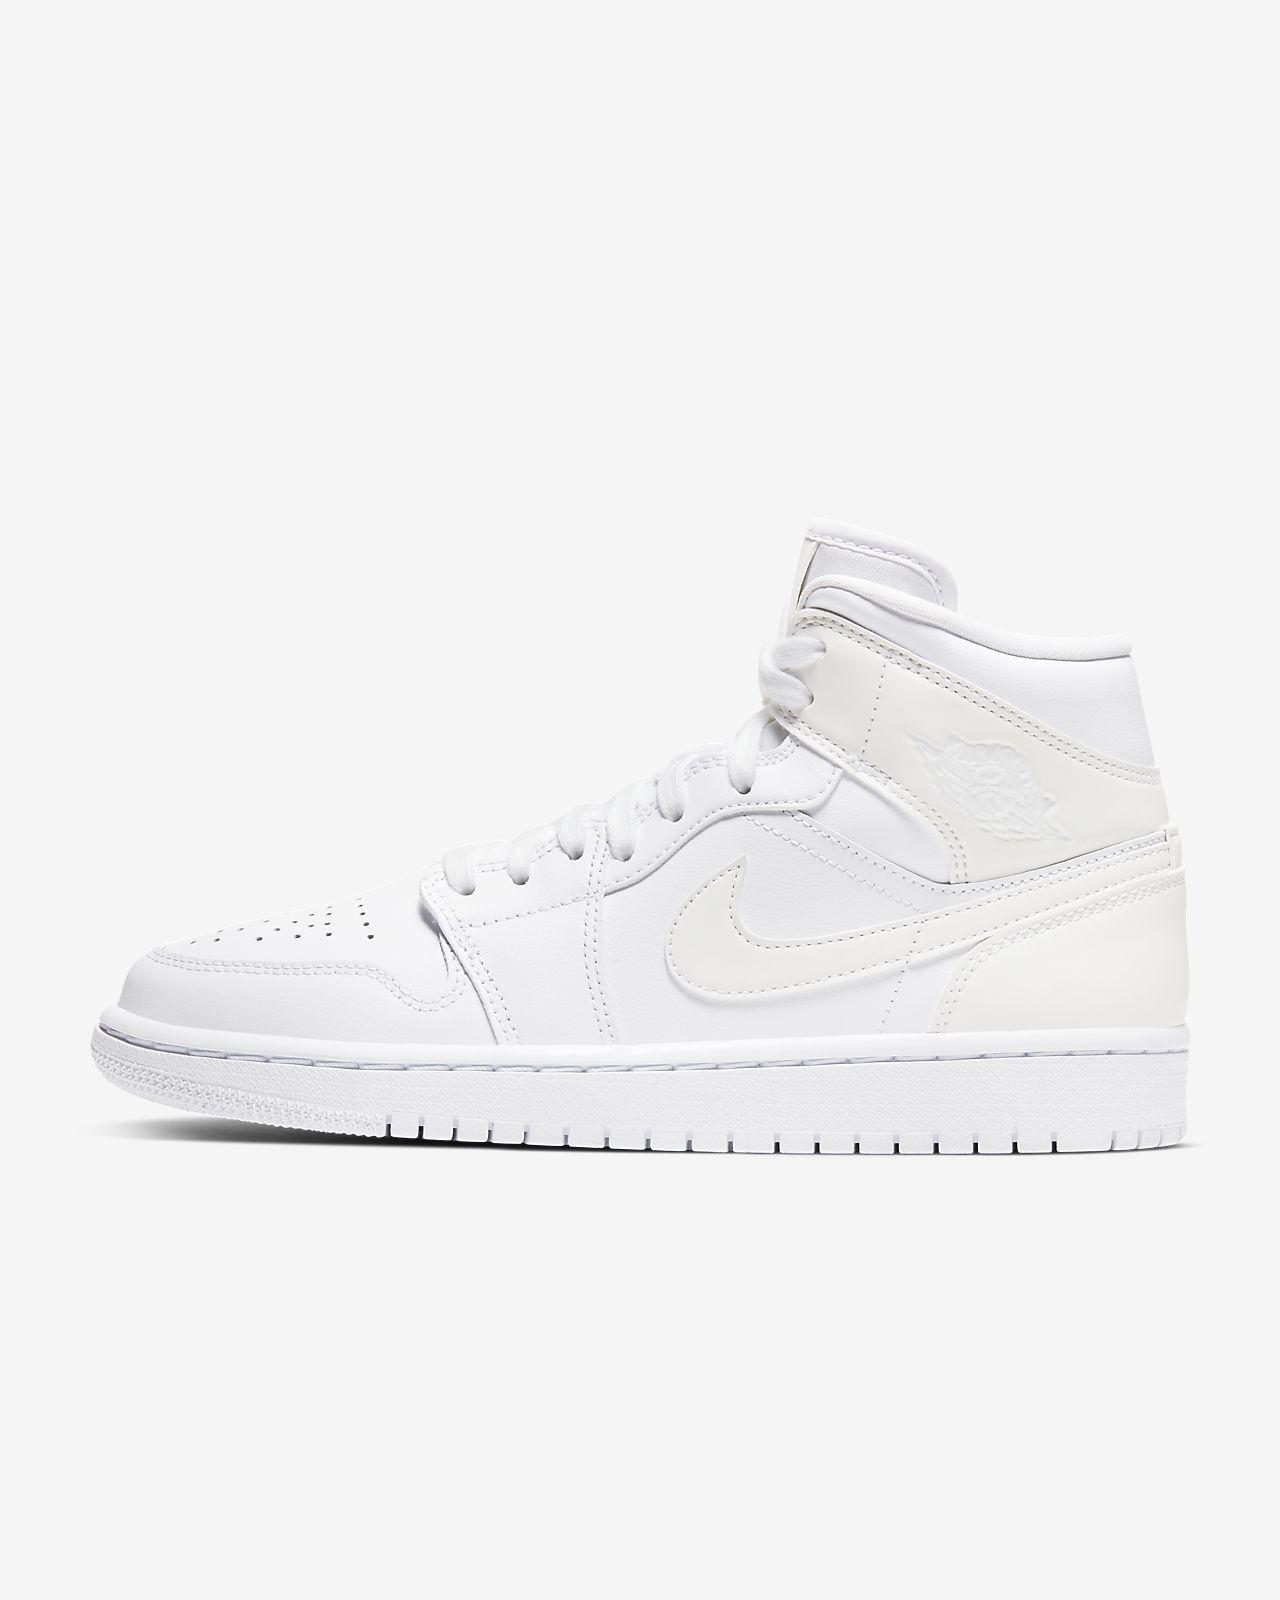 Zapatillas casual de mujer Air Jordan 1 Mid Nike